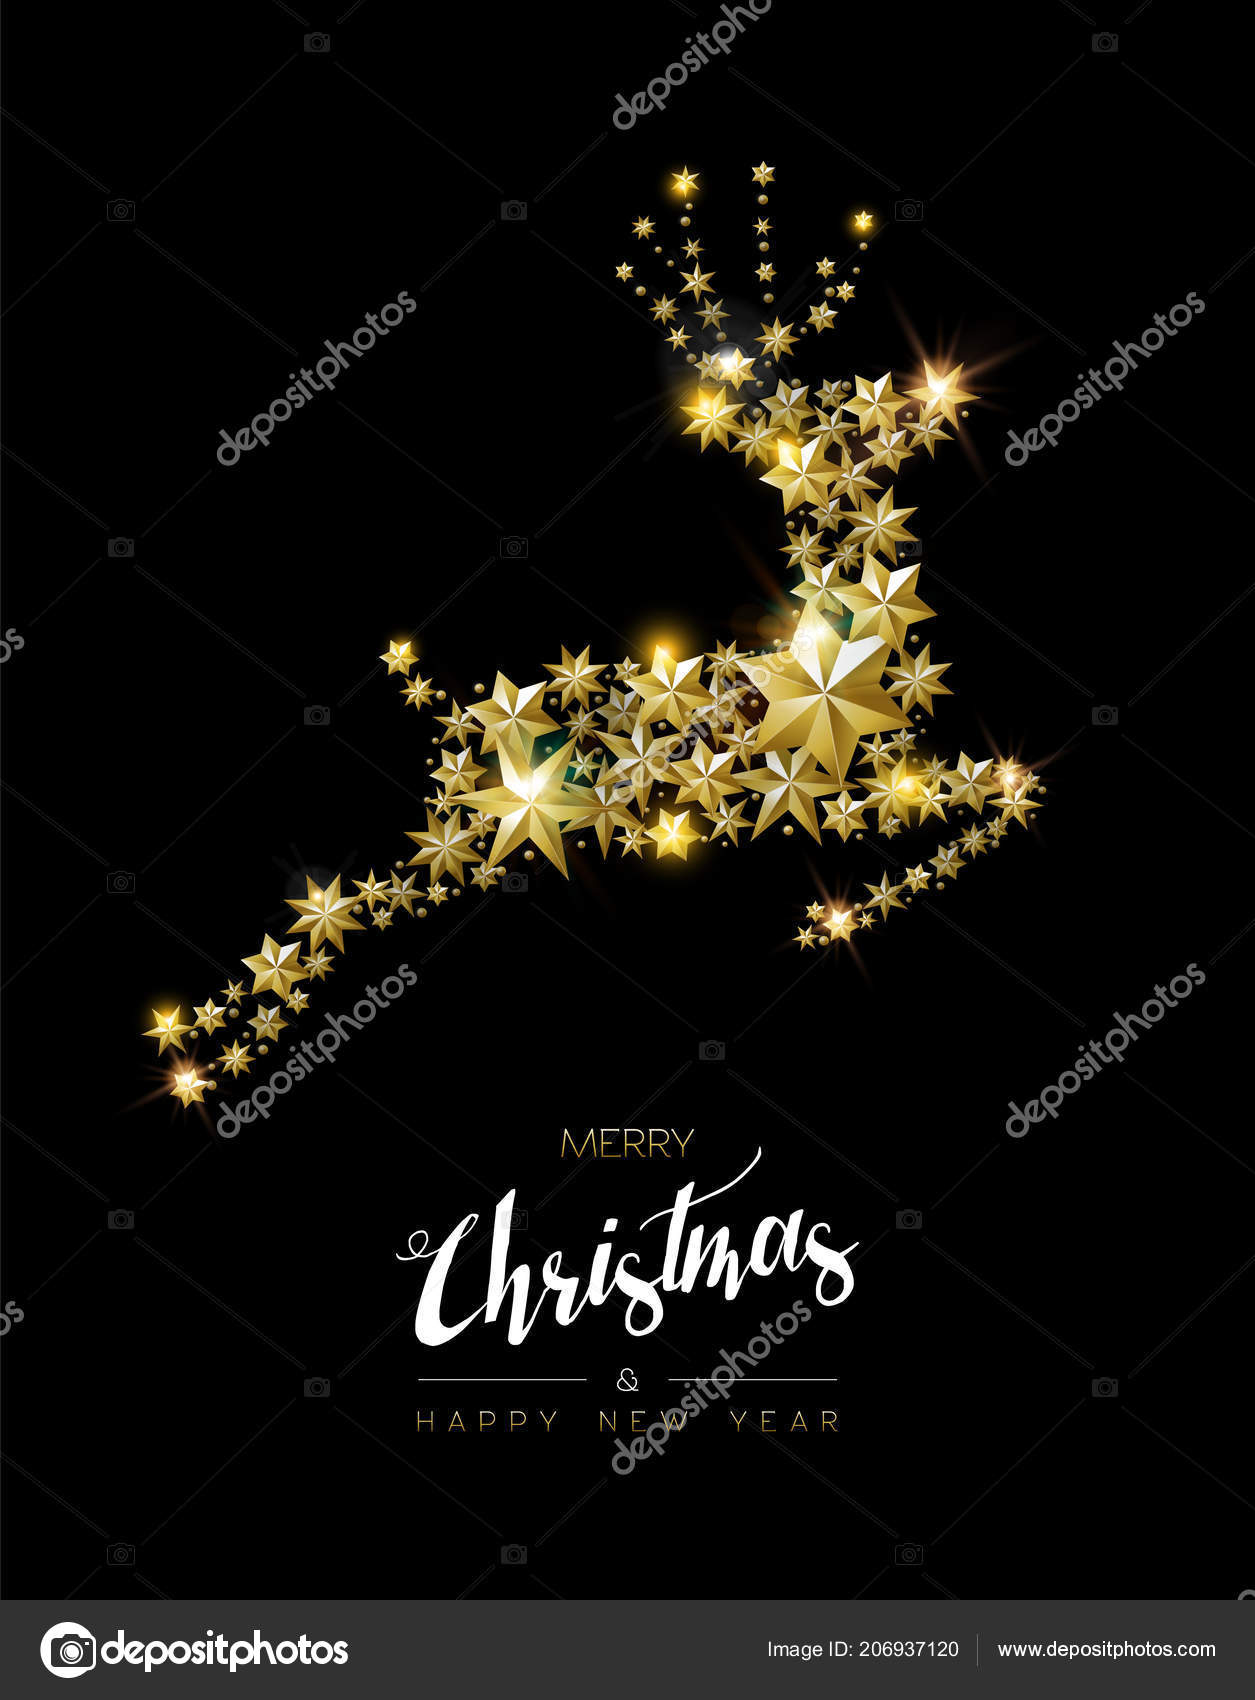 Happy New Year Elegant Images 57